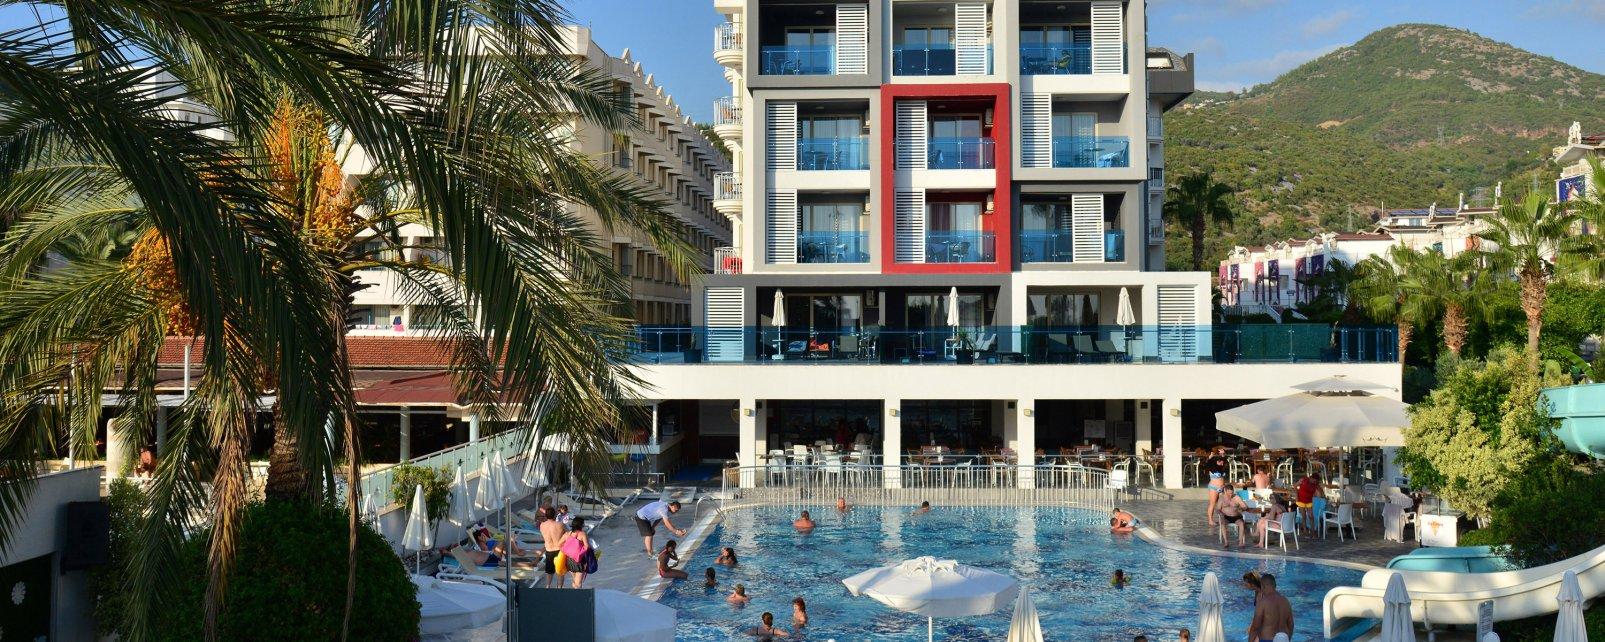 Hôtel White City Beach